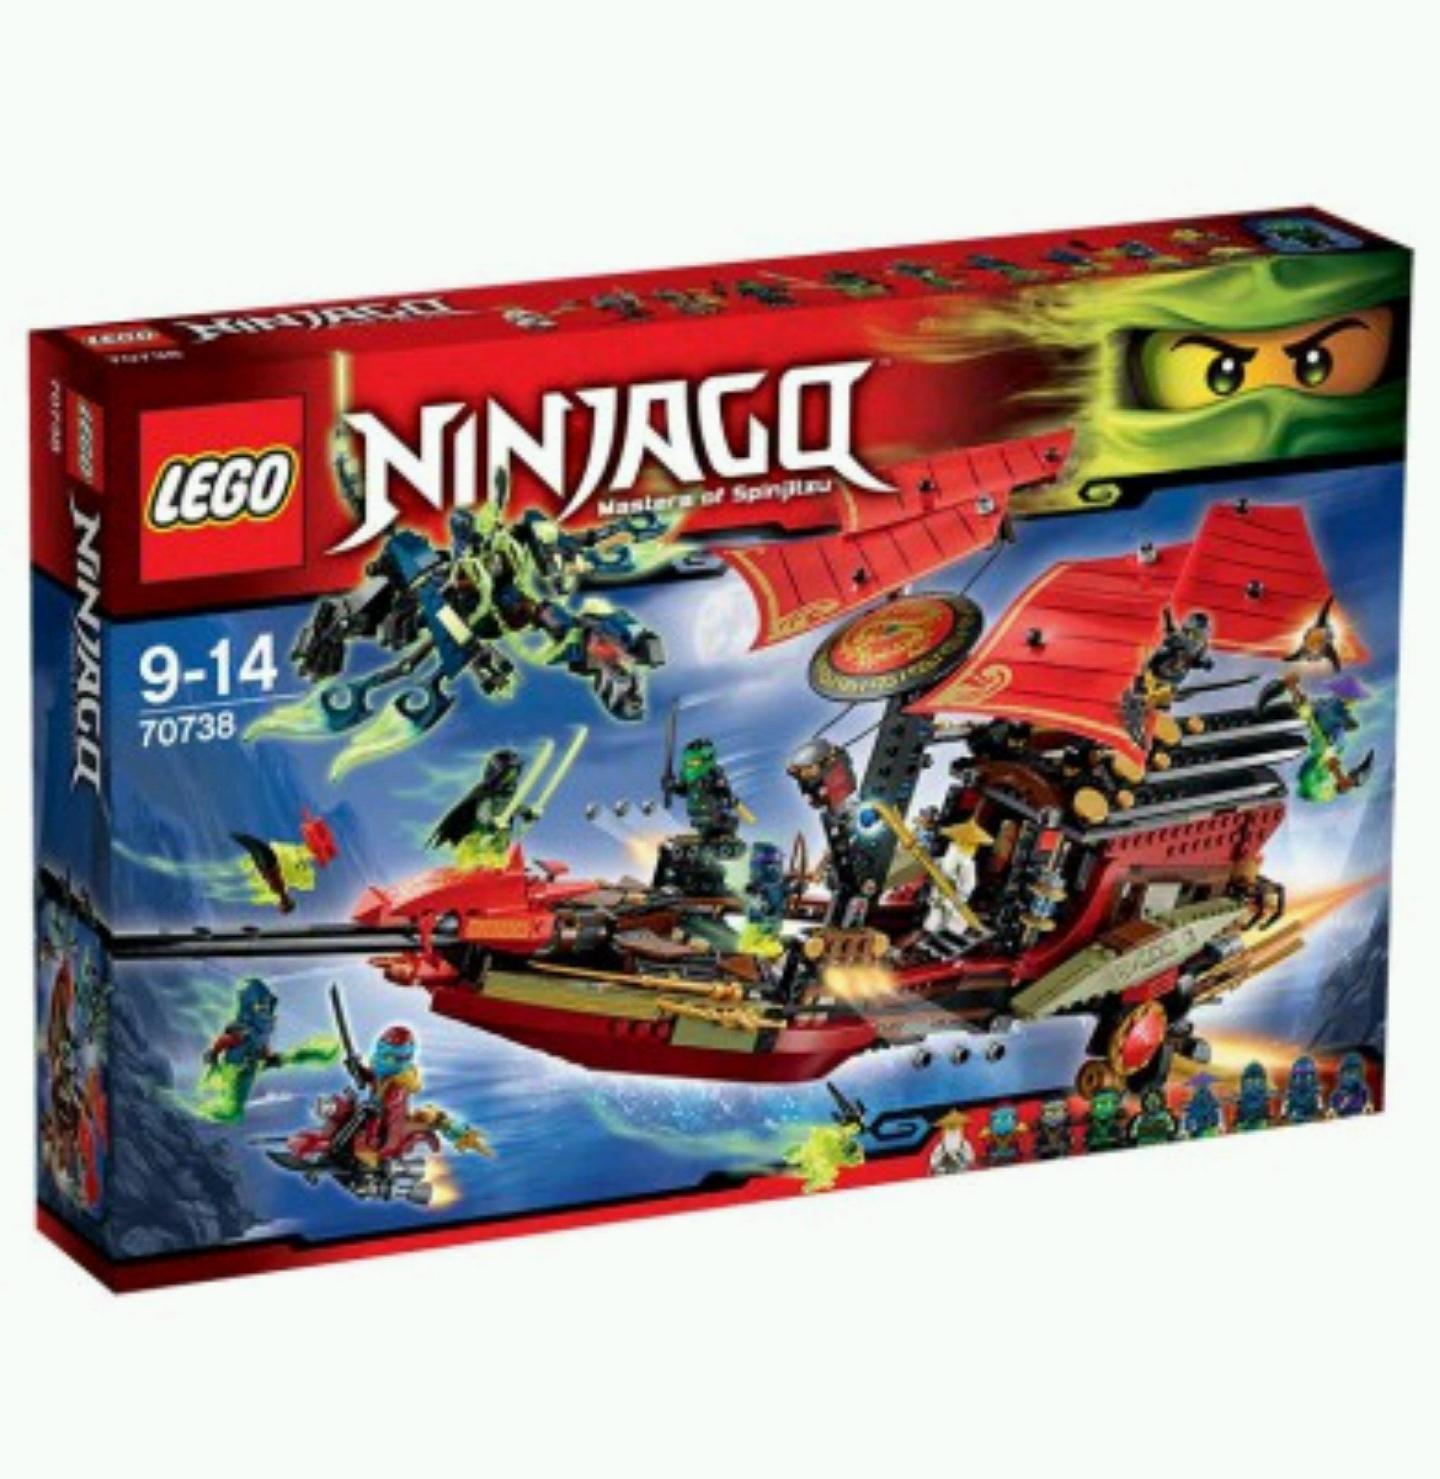 [Spielemax] Lego Ninjago 70738 - letzte Flug des Ninja-Flugsegler